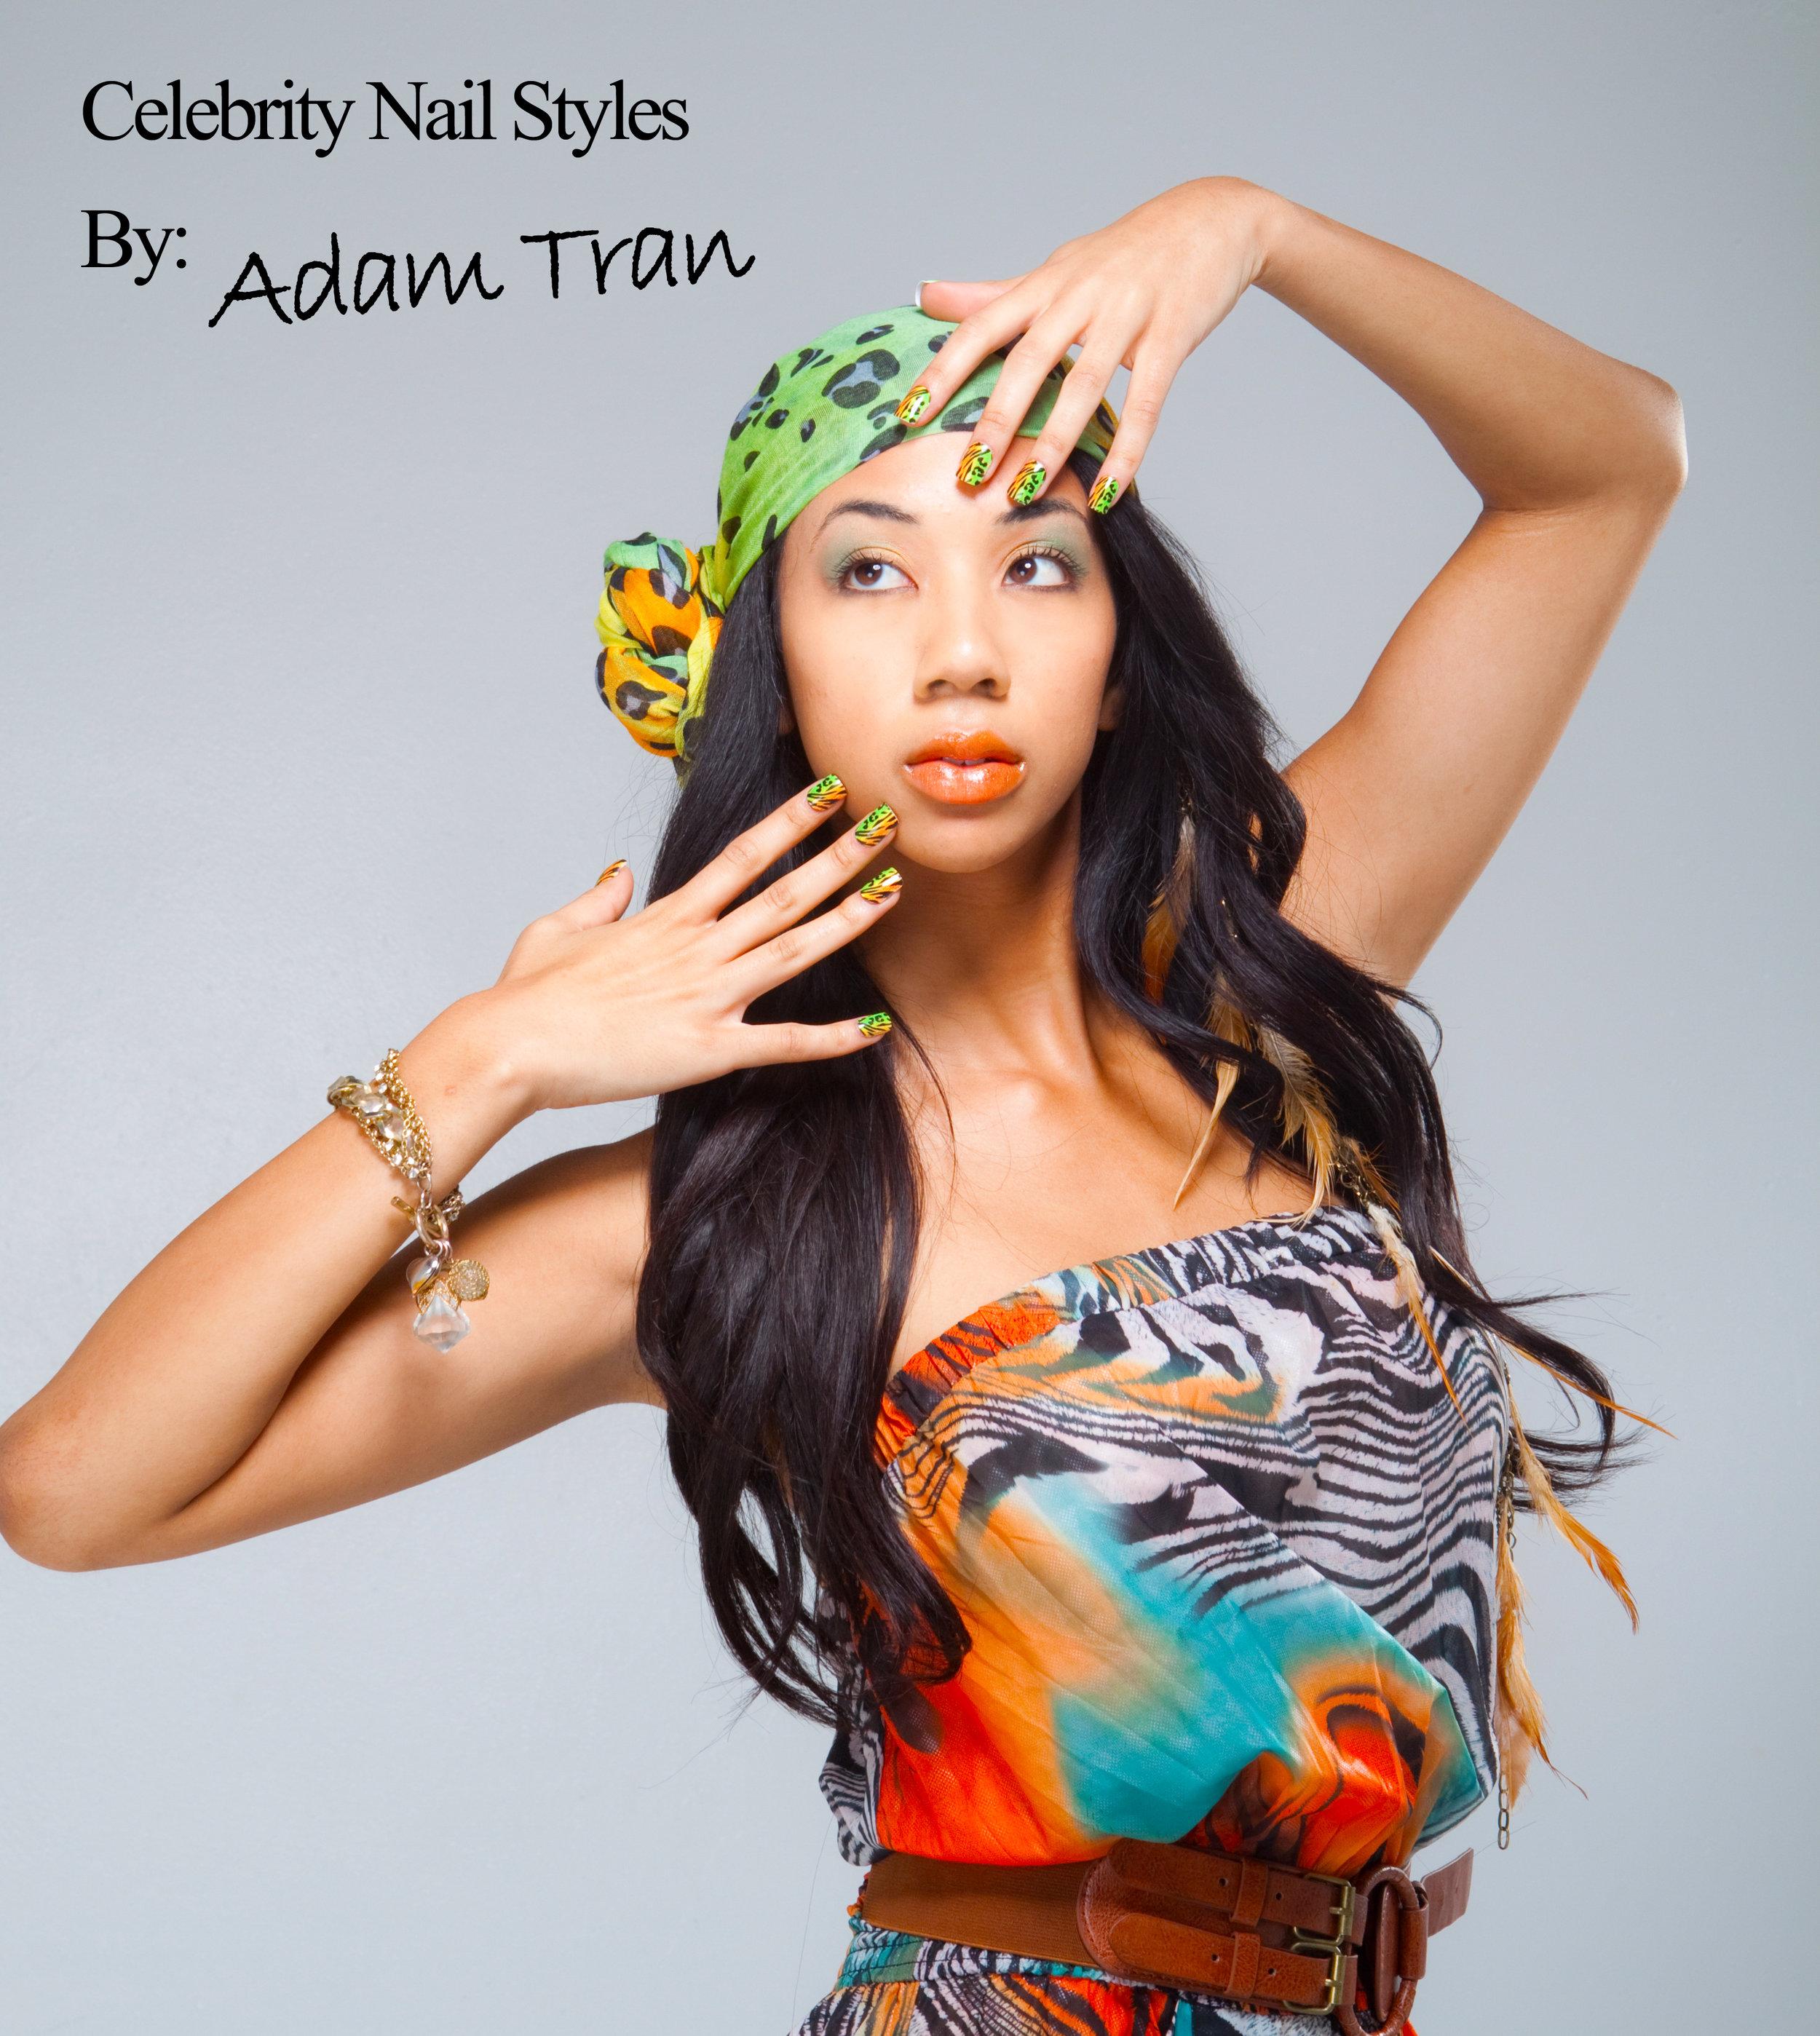 Adam tran content (1).jpg